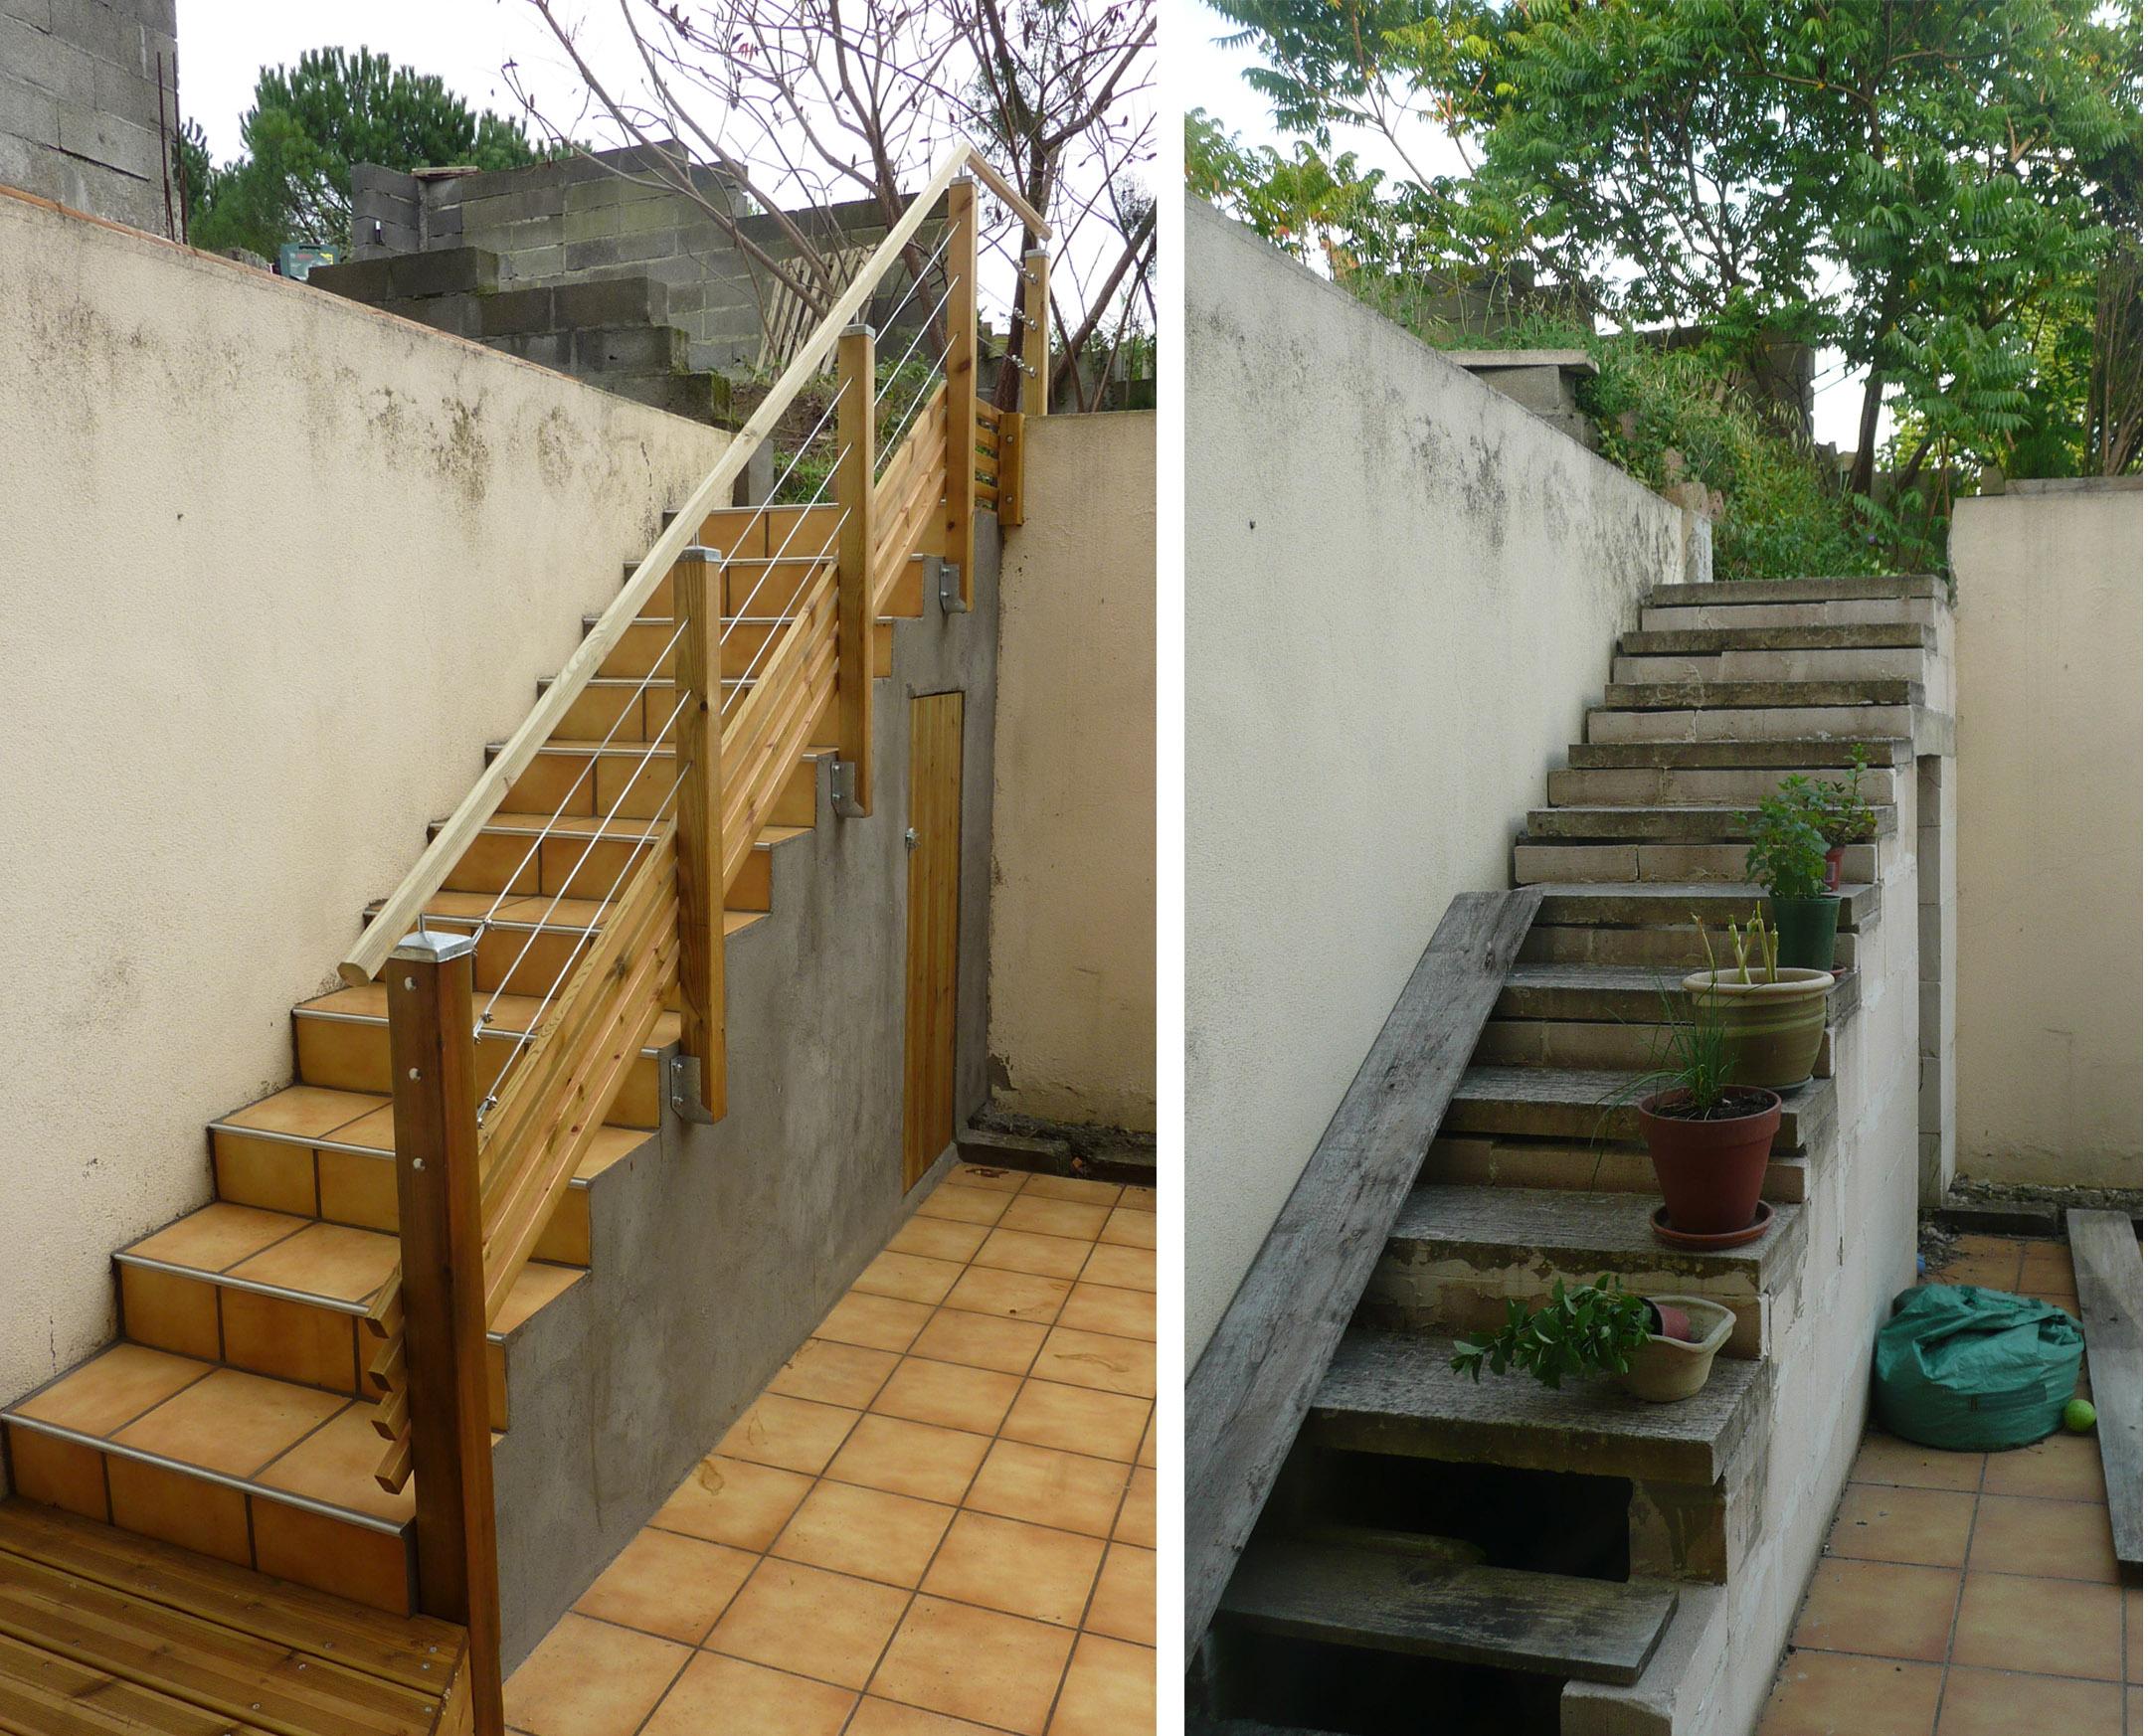 changer rambarde escalier bois best escaliers with changer rambarde escalier bois cool rampe. Black Bedroom Furniture Sets. Home Design Ideas